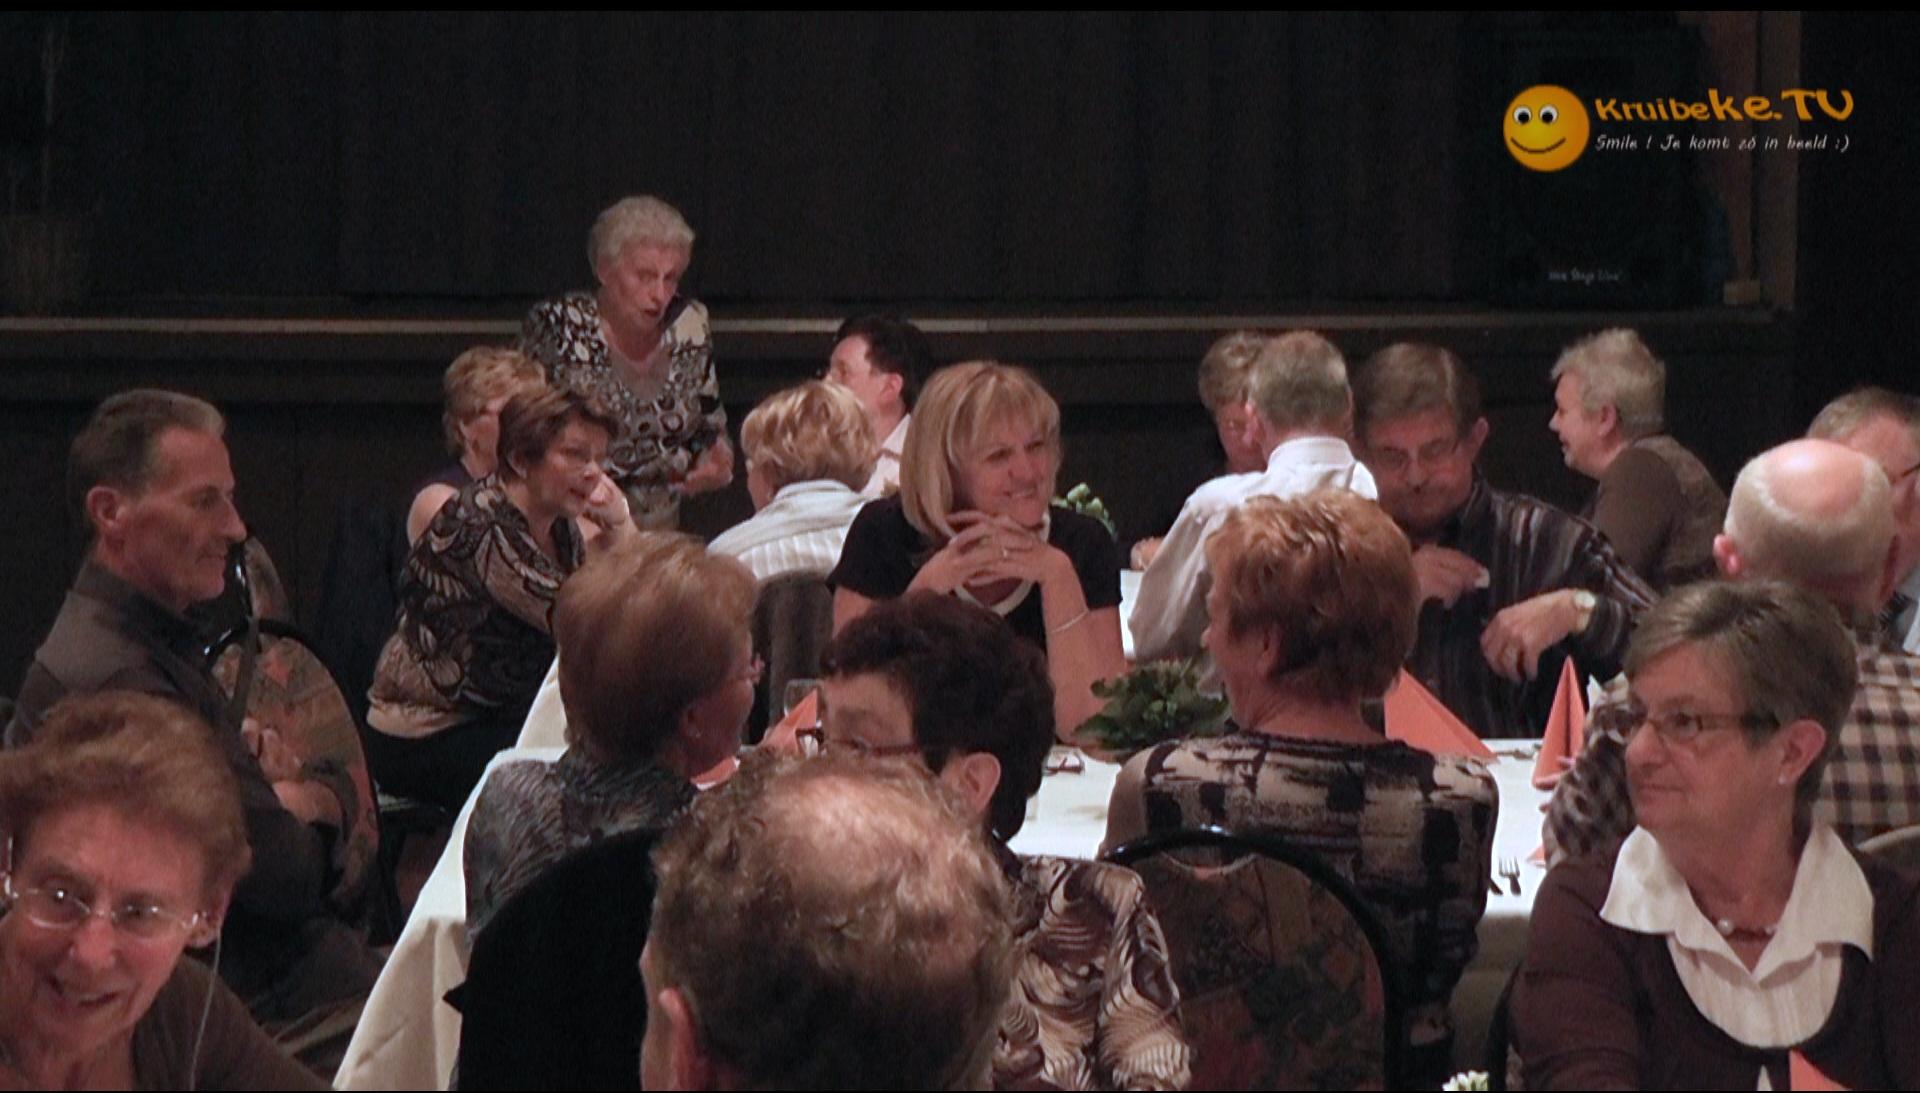 de 70 jarigen uit Kruibeke komen samen in 't Rozeke